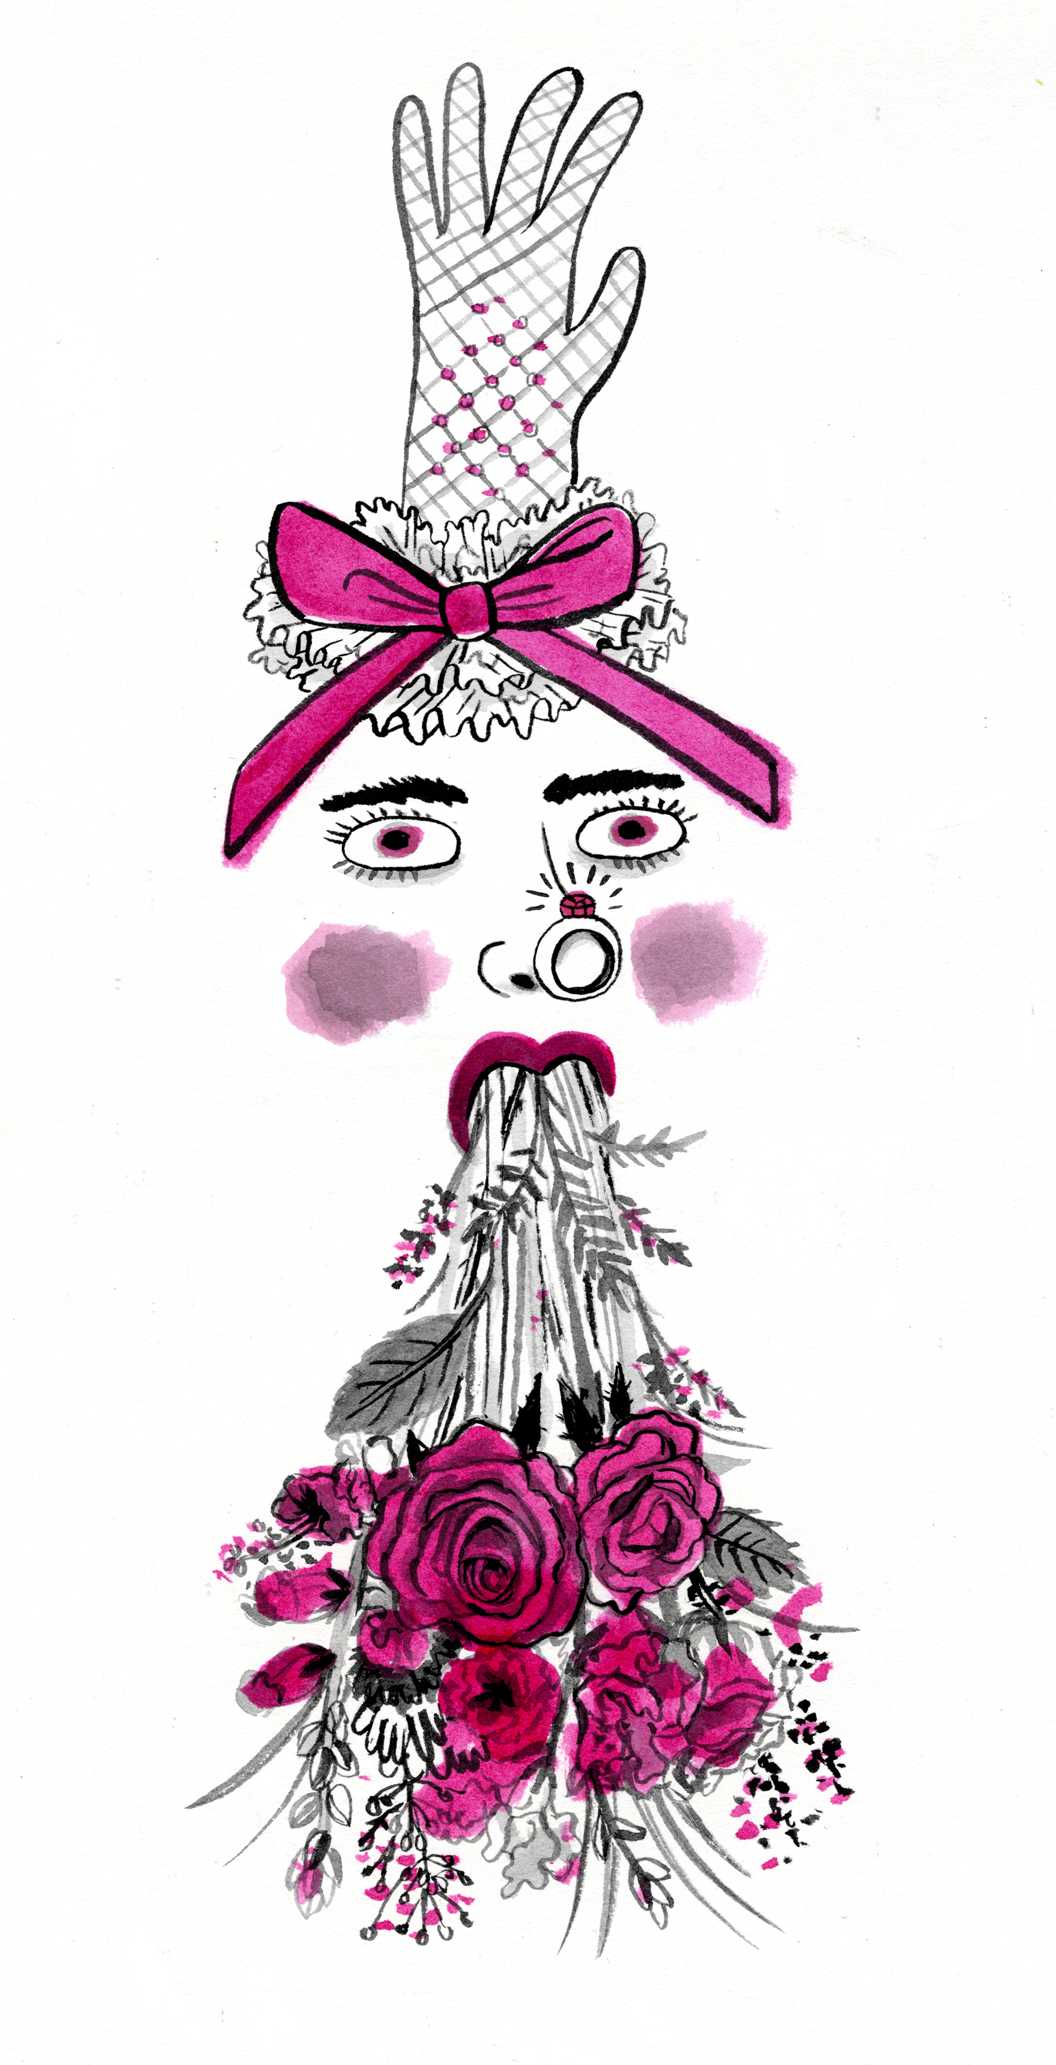 """A Heartbroken Temp at Brides.com"""